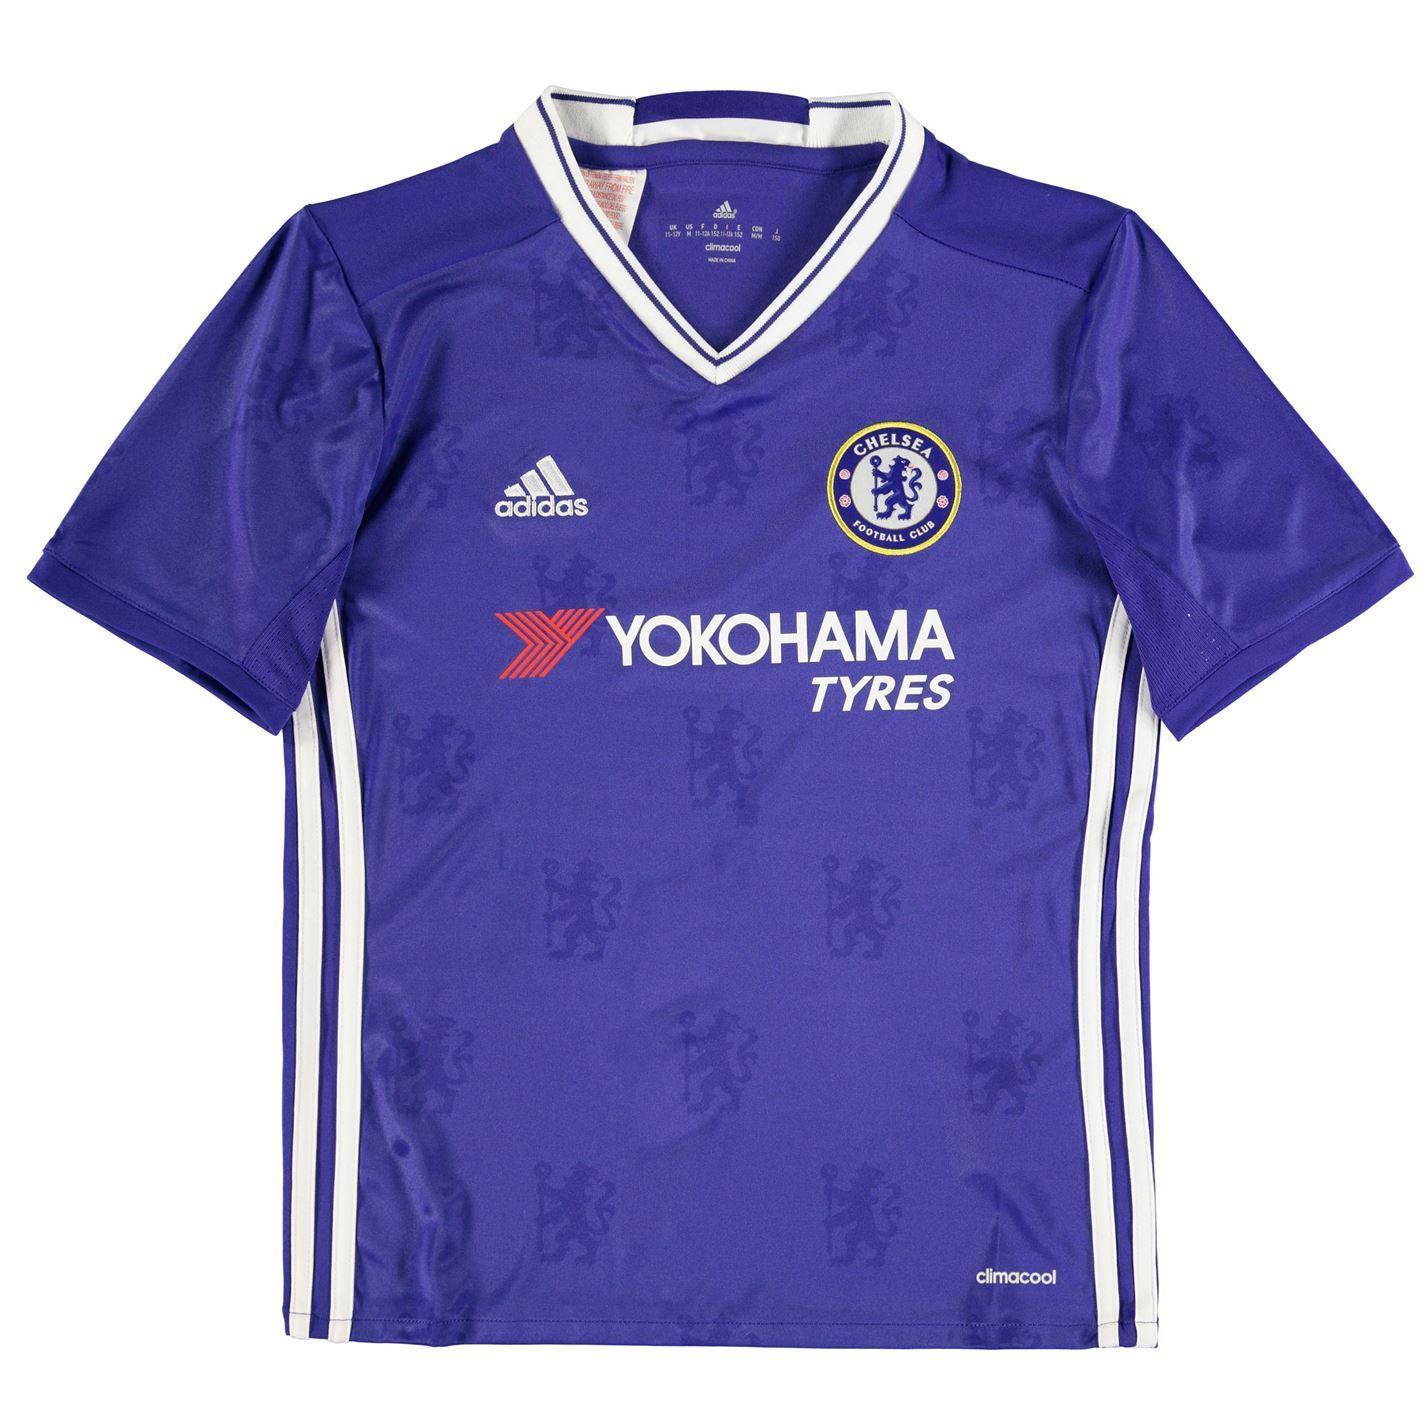 Adidas Chelsea FC Home Jersey 2016 2017 Juniors Royal Football Soccer Top  Shirt 0ca519309